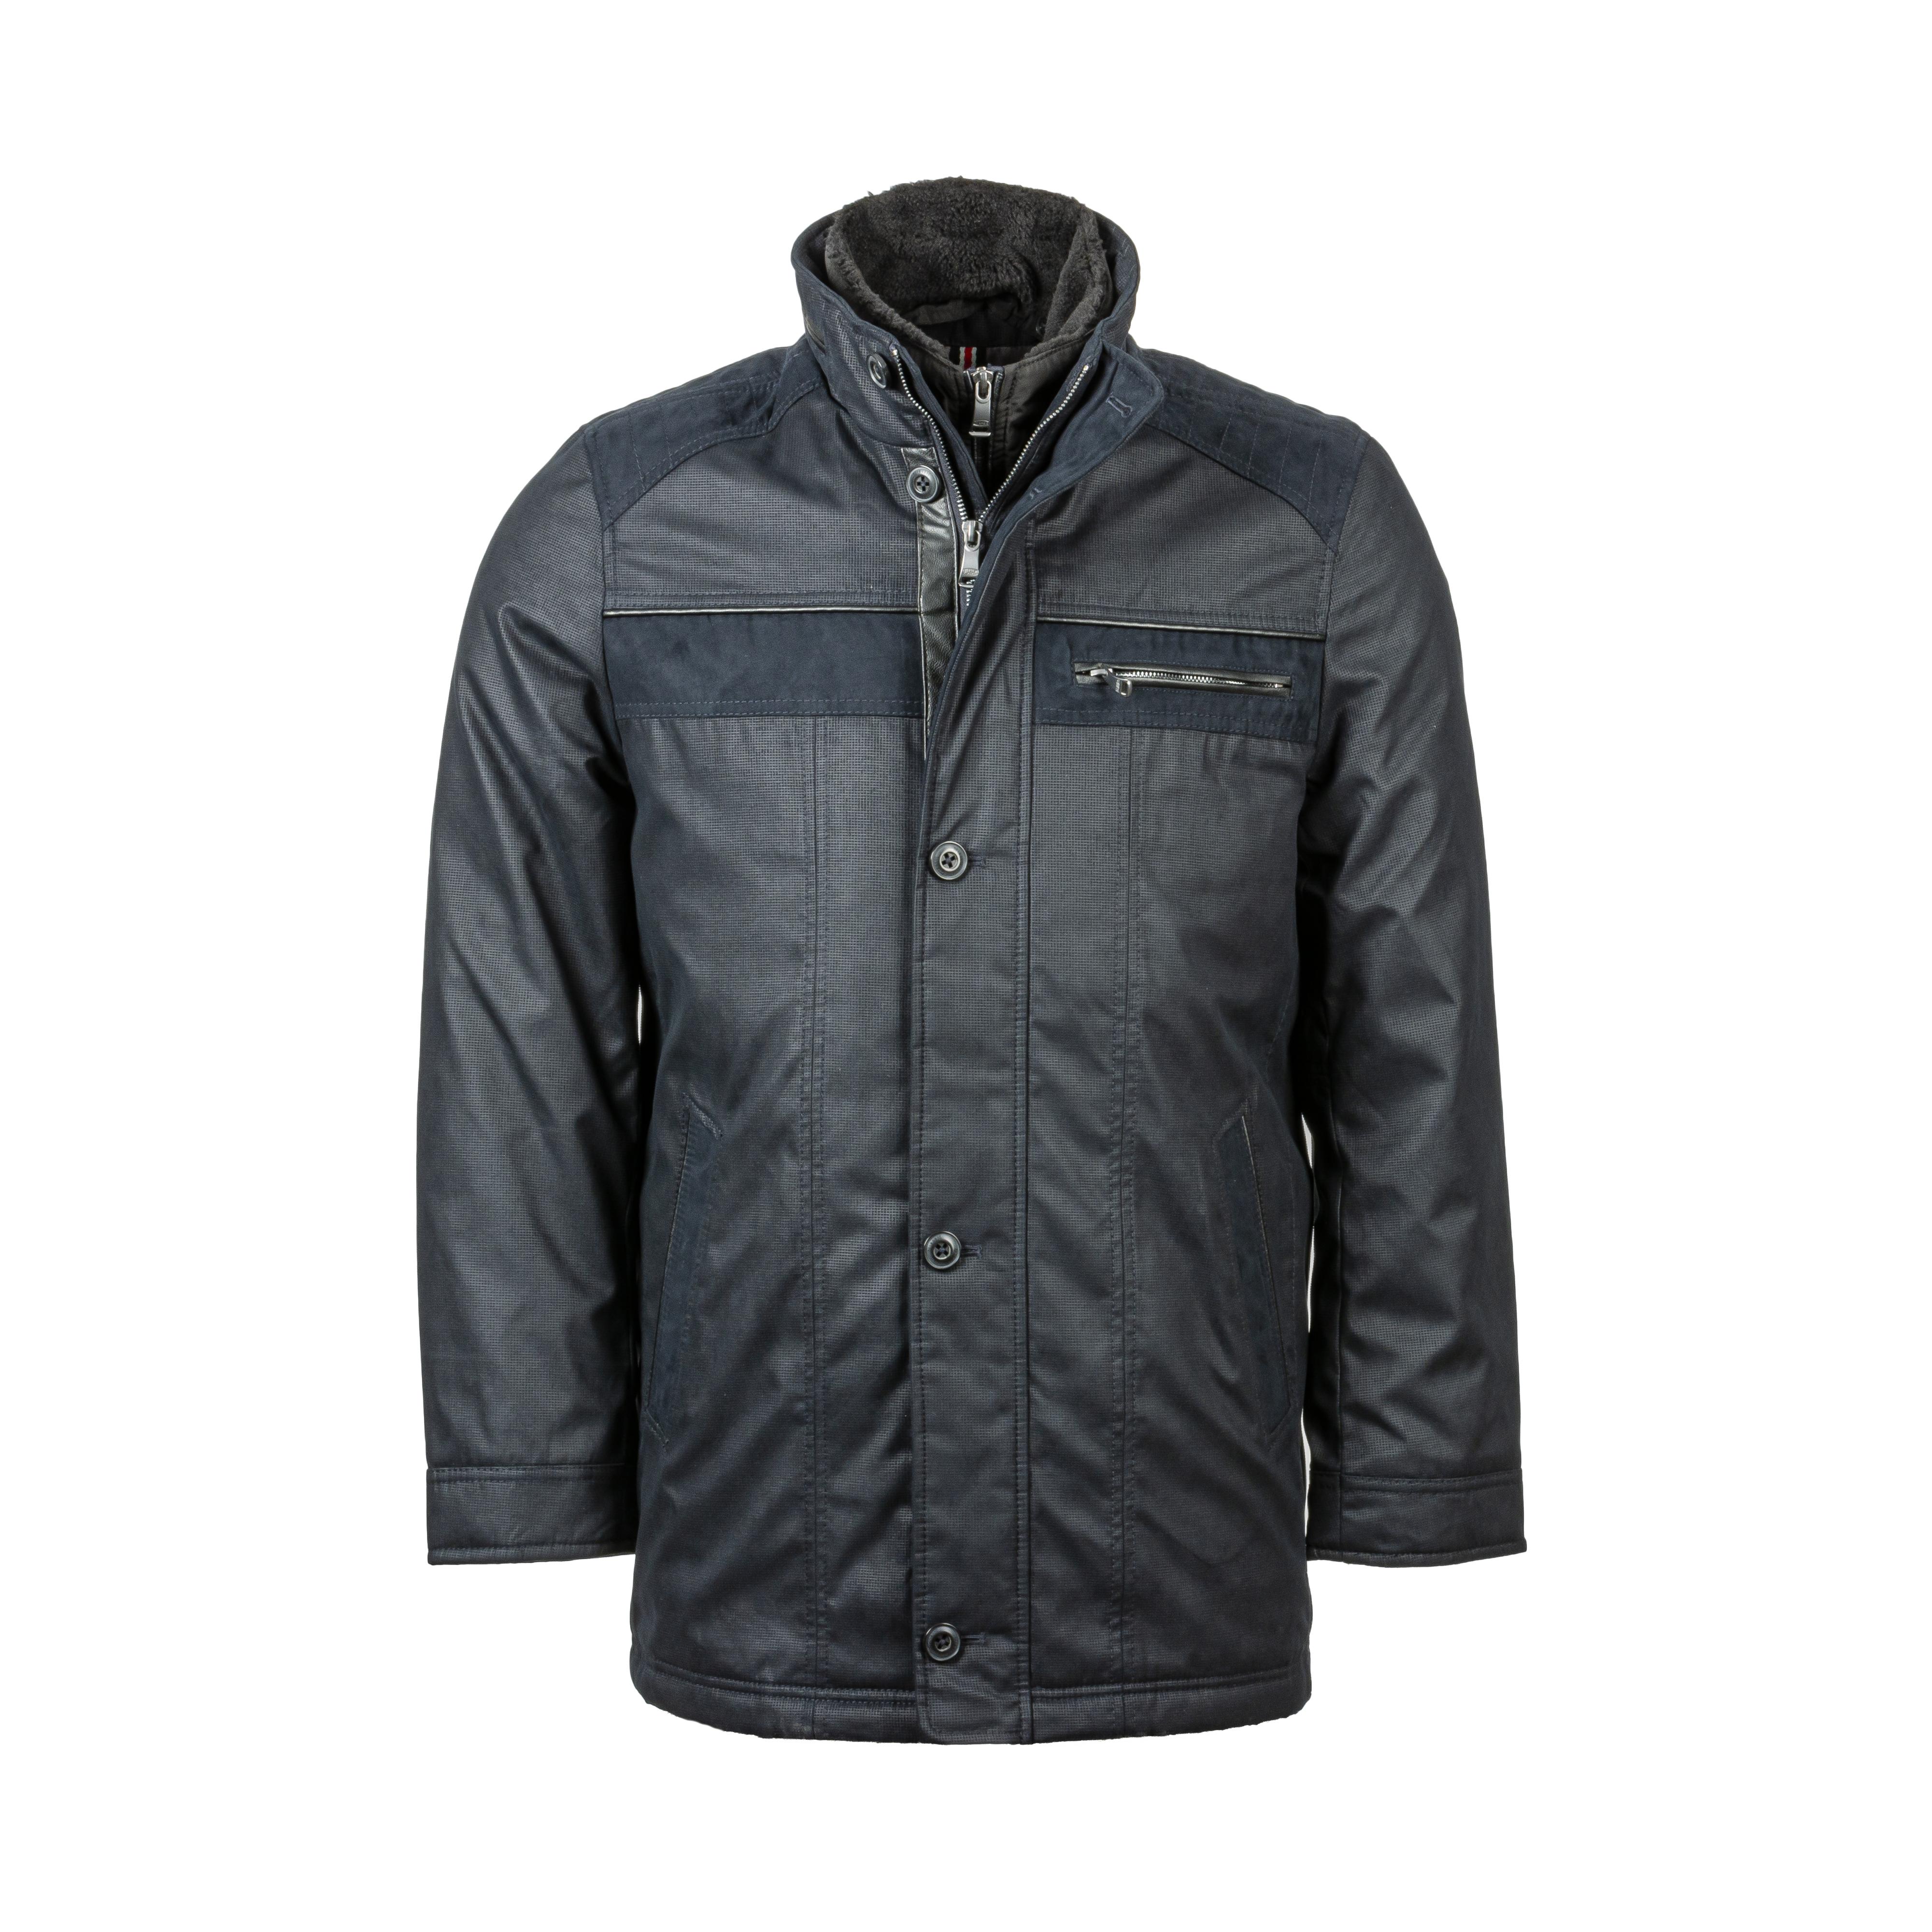 Manteau Delahaye bi-matière bleu marine